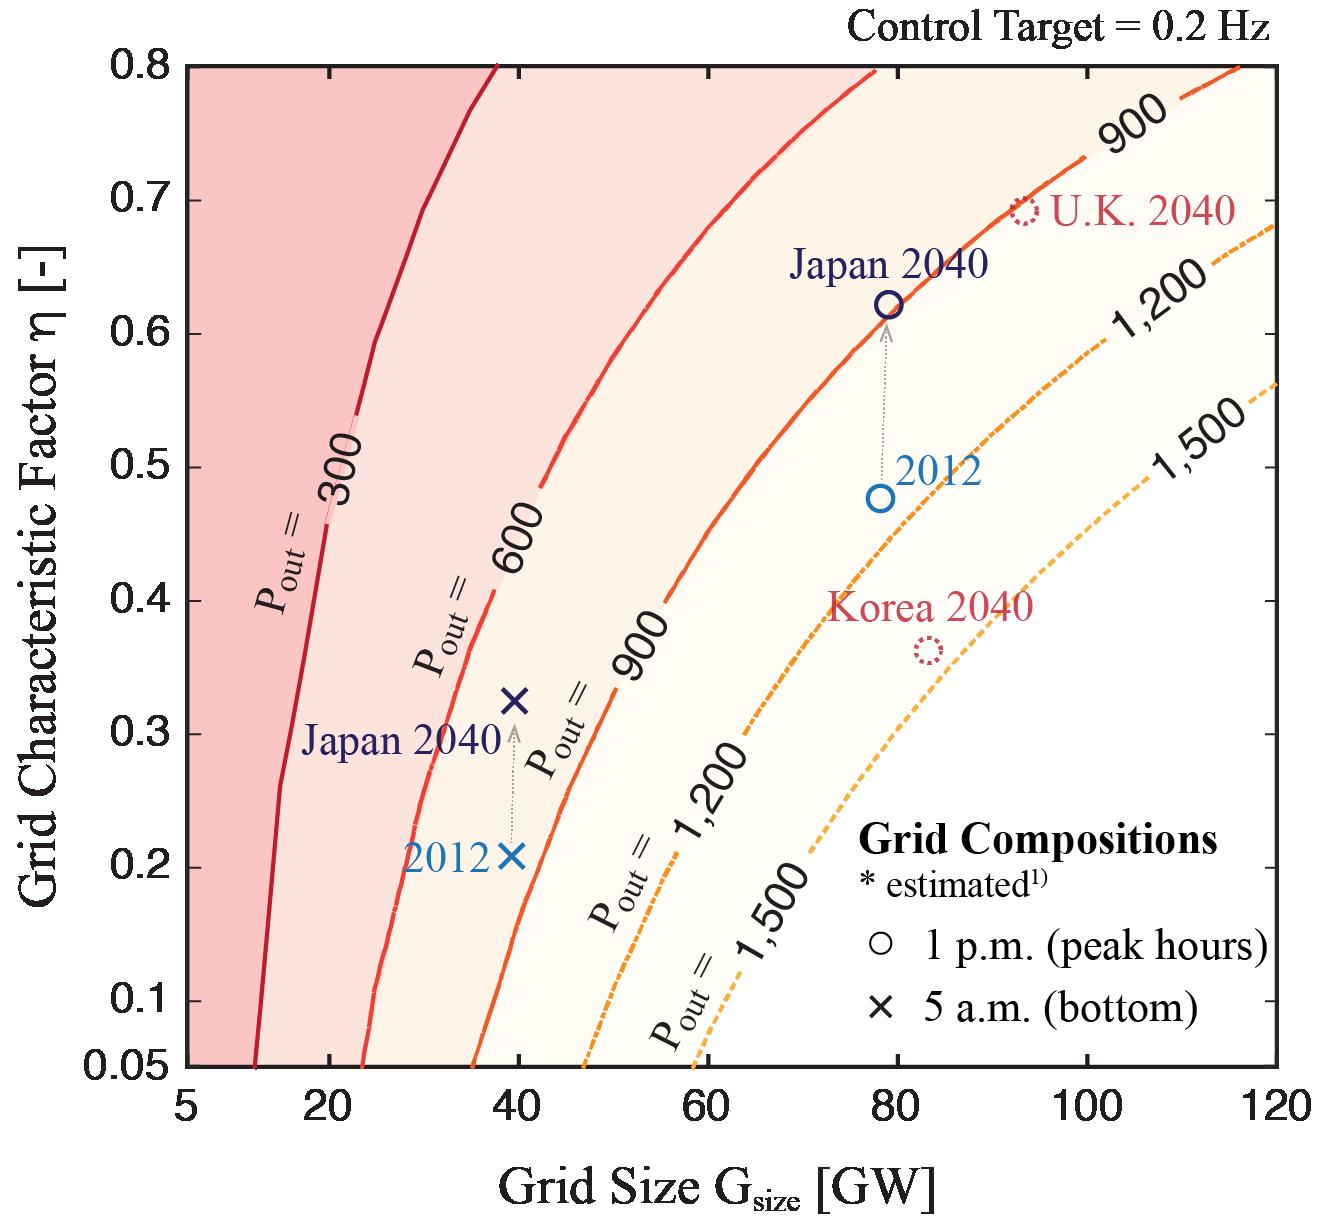 (Presentation) 動的シミュレーションによる核融合炉の電力網導入限界の定量的評価 [in Japanese]